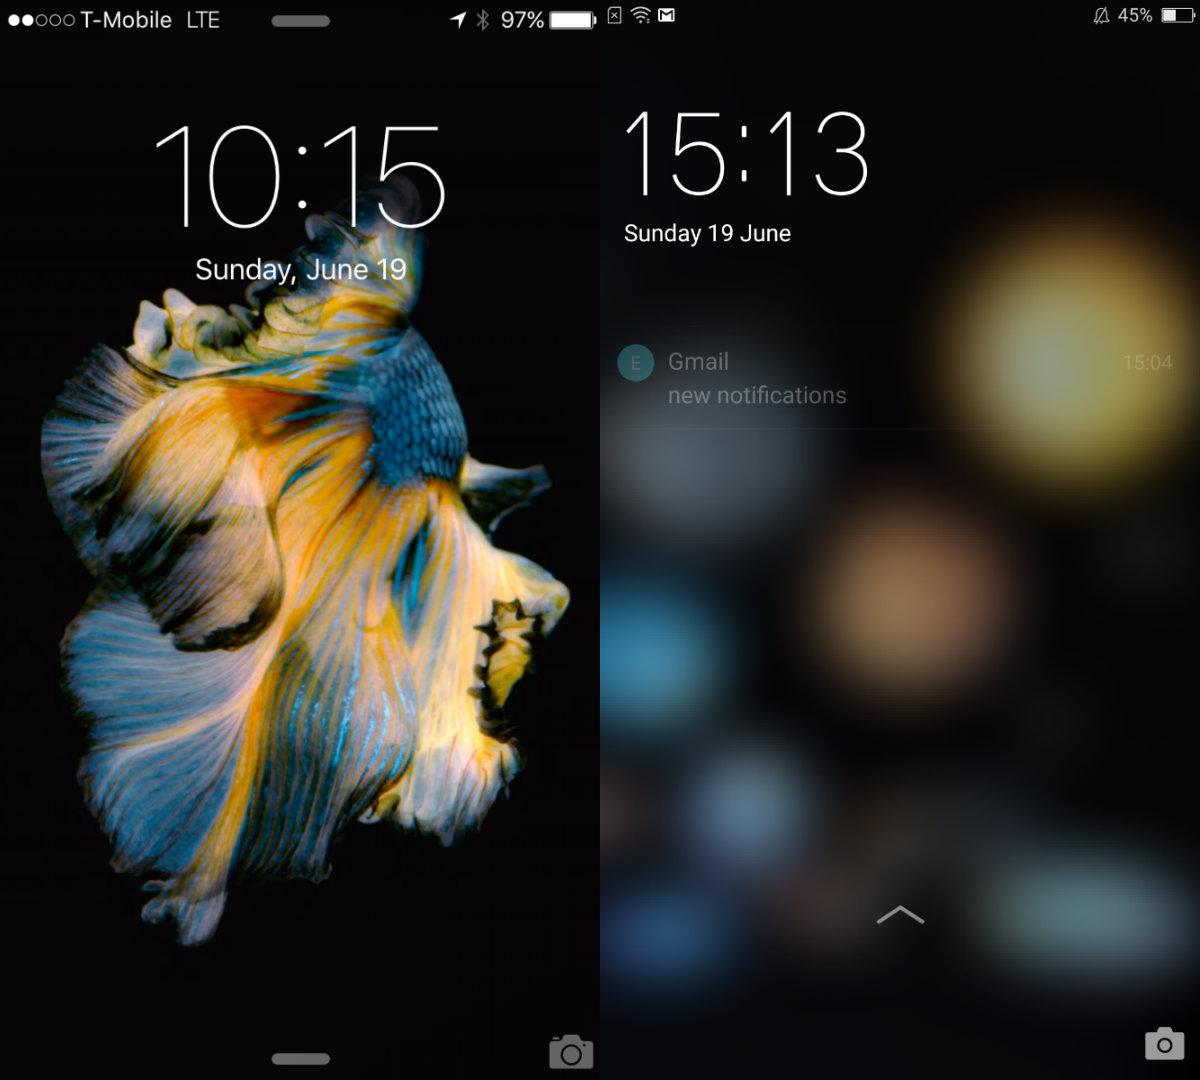 Oppo F1 Plus Review : The Selfie Expert has Arrived - MobileTechTalk